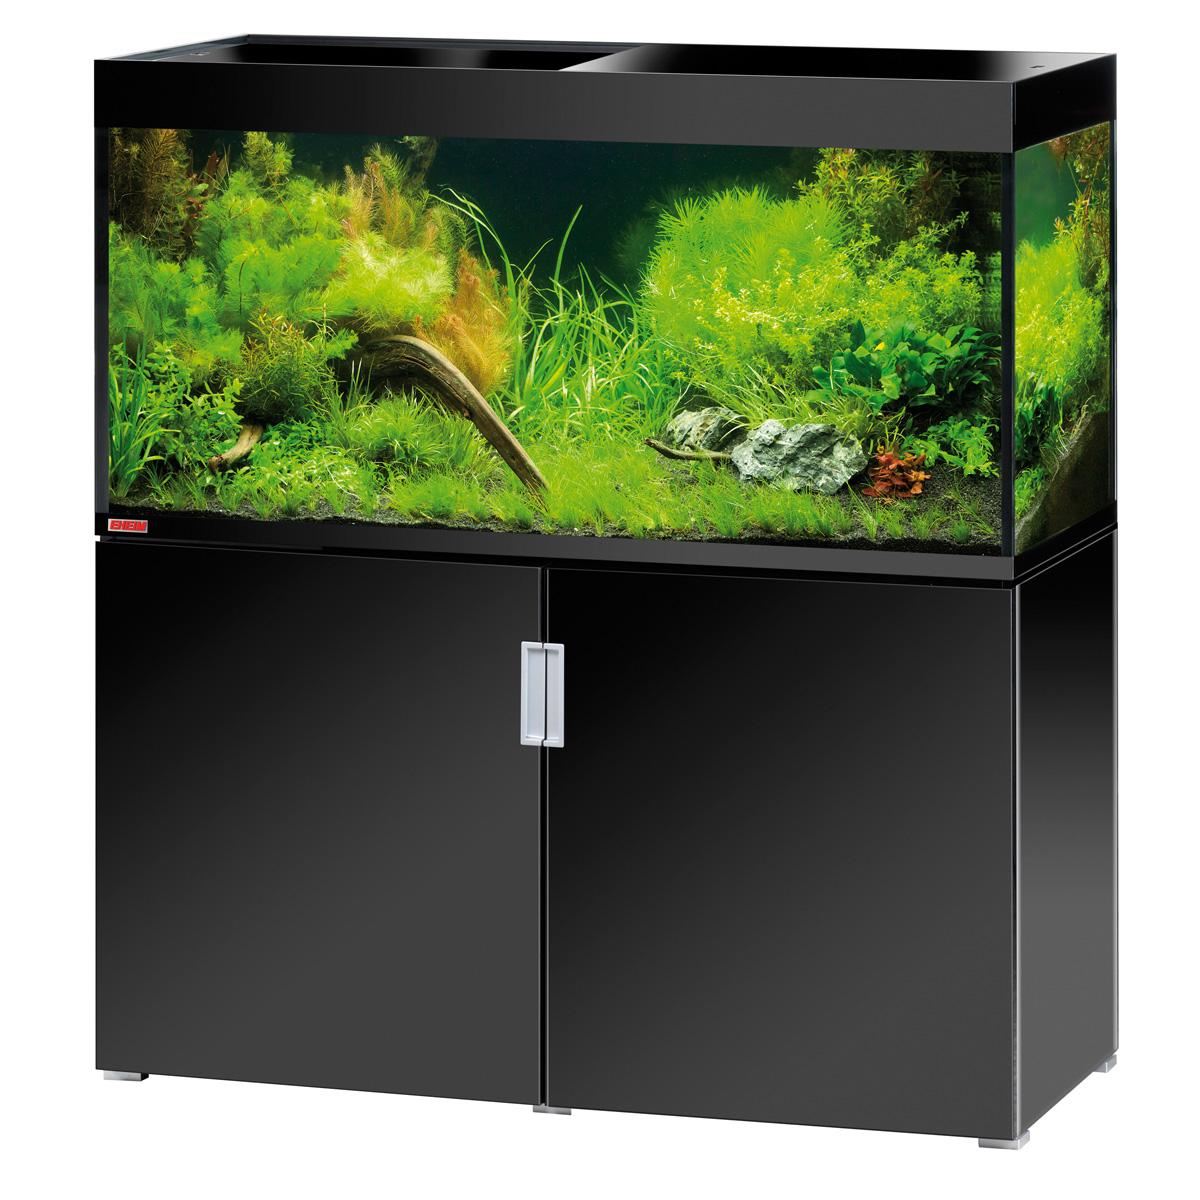 eheim incpiria 400 mit led beleuchtung kaufen bei zooroyal. Black Bedroom Furniture Sets. Home Design Ideas